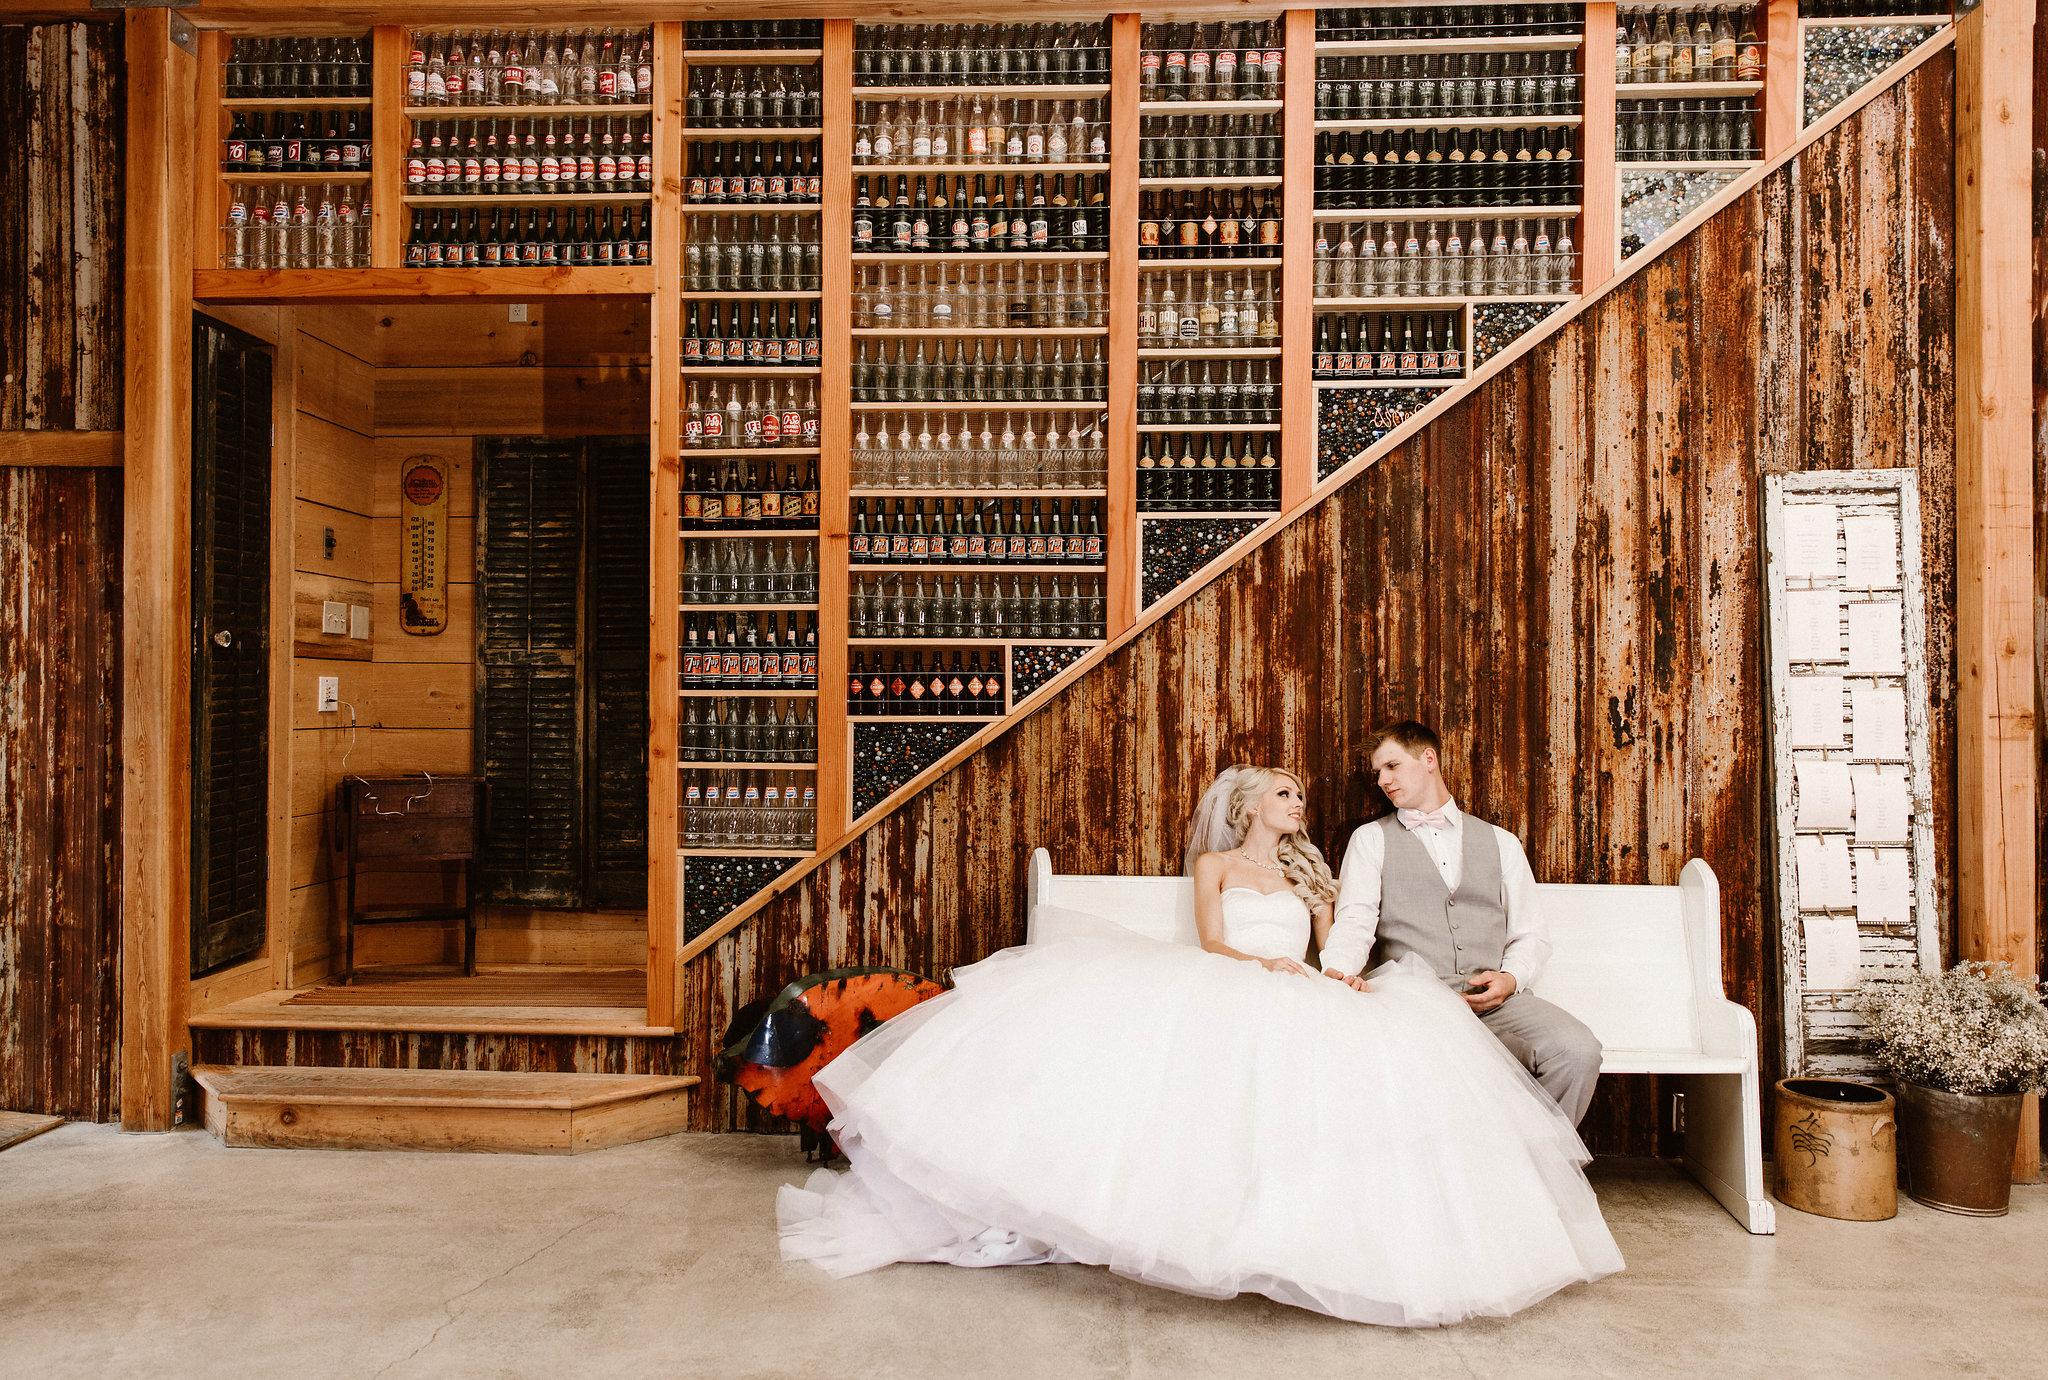 red-tree-barn-poulsbo-wedding-venues-Seattle-photographer-adina-preston-13.jpg